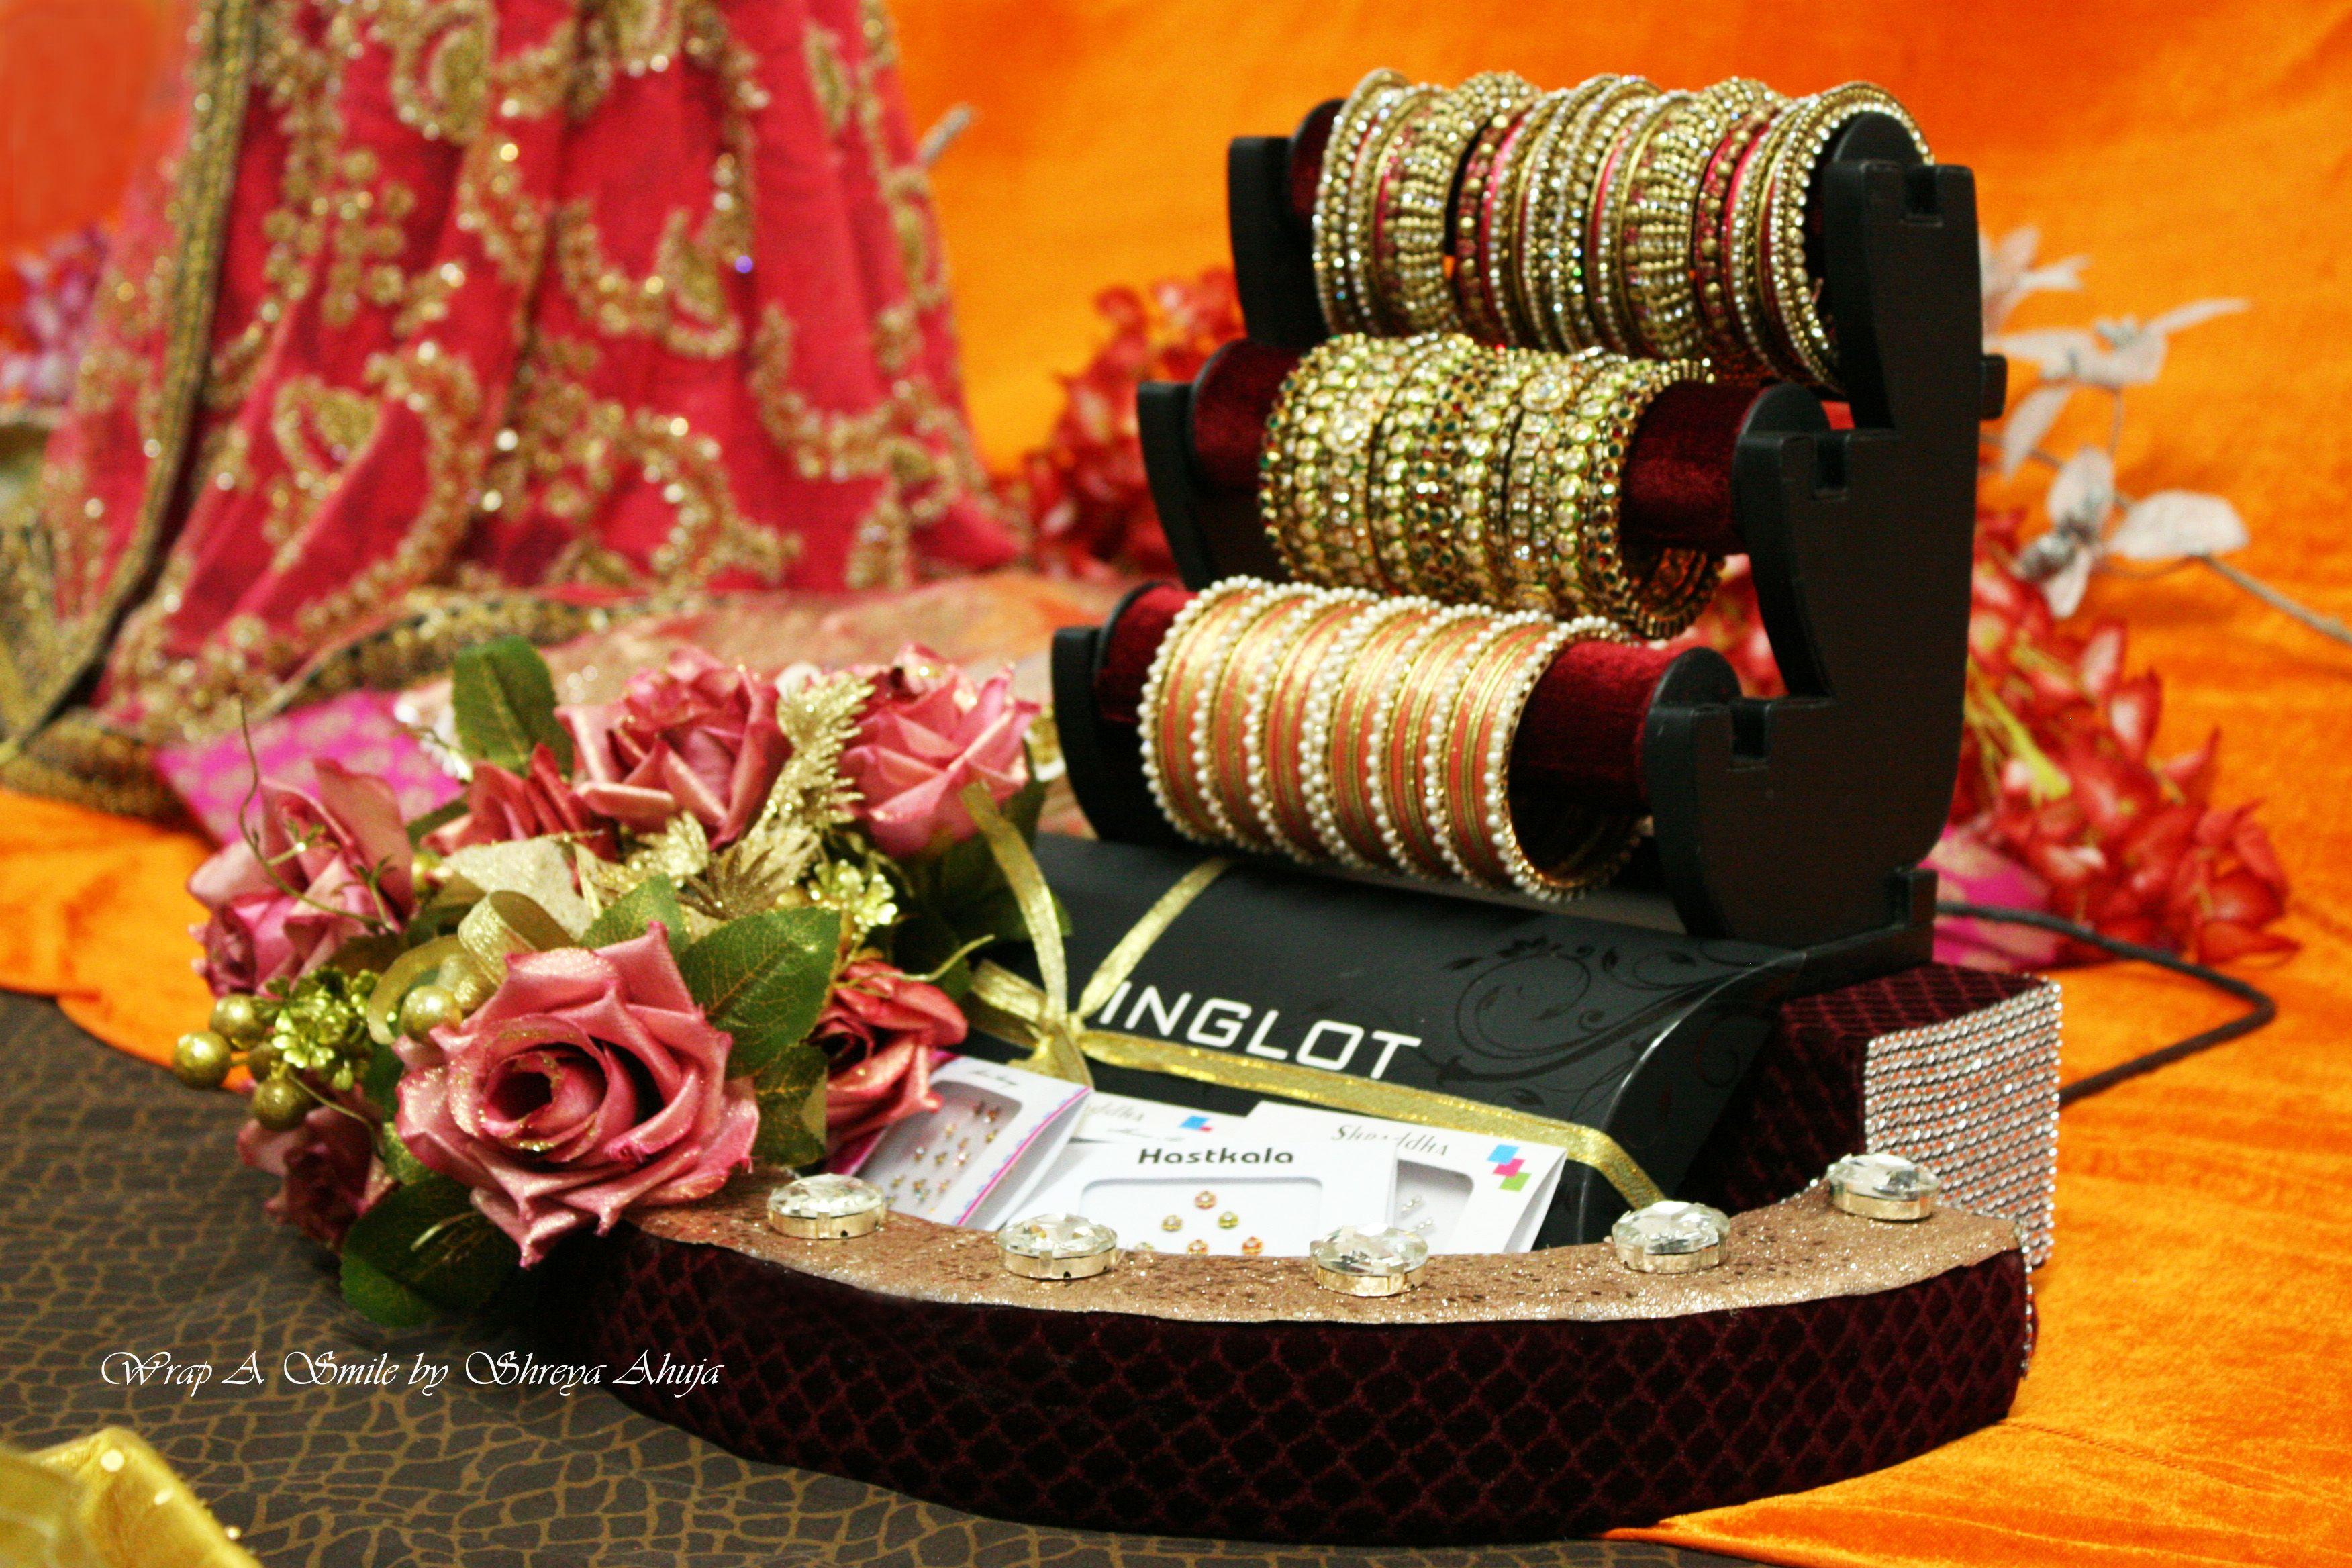 Trousseau Packing Wrap A Smile Dream Wedding Pinterest